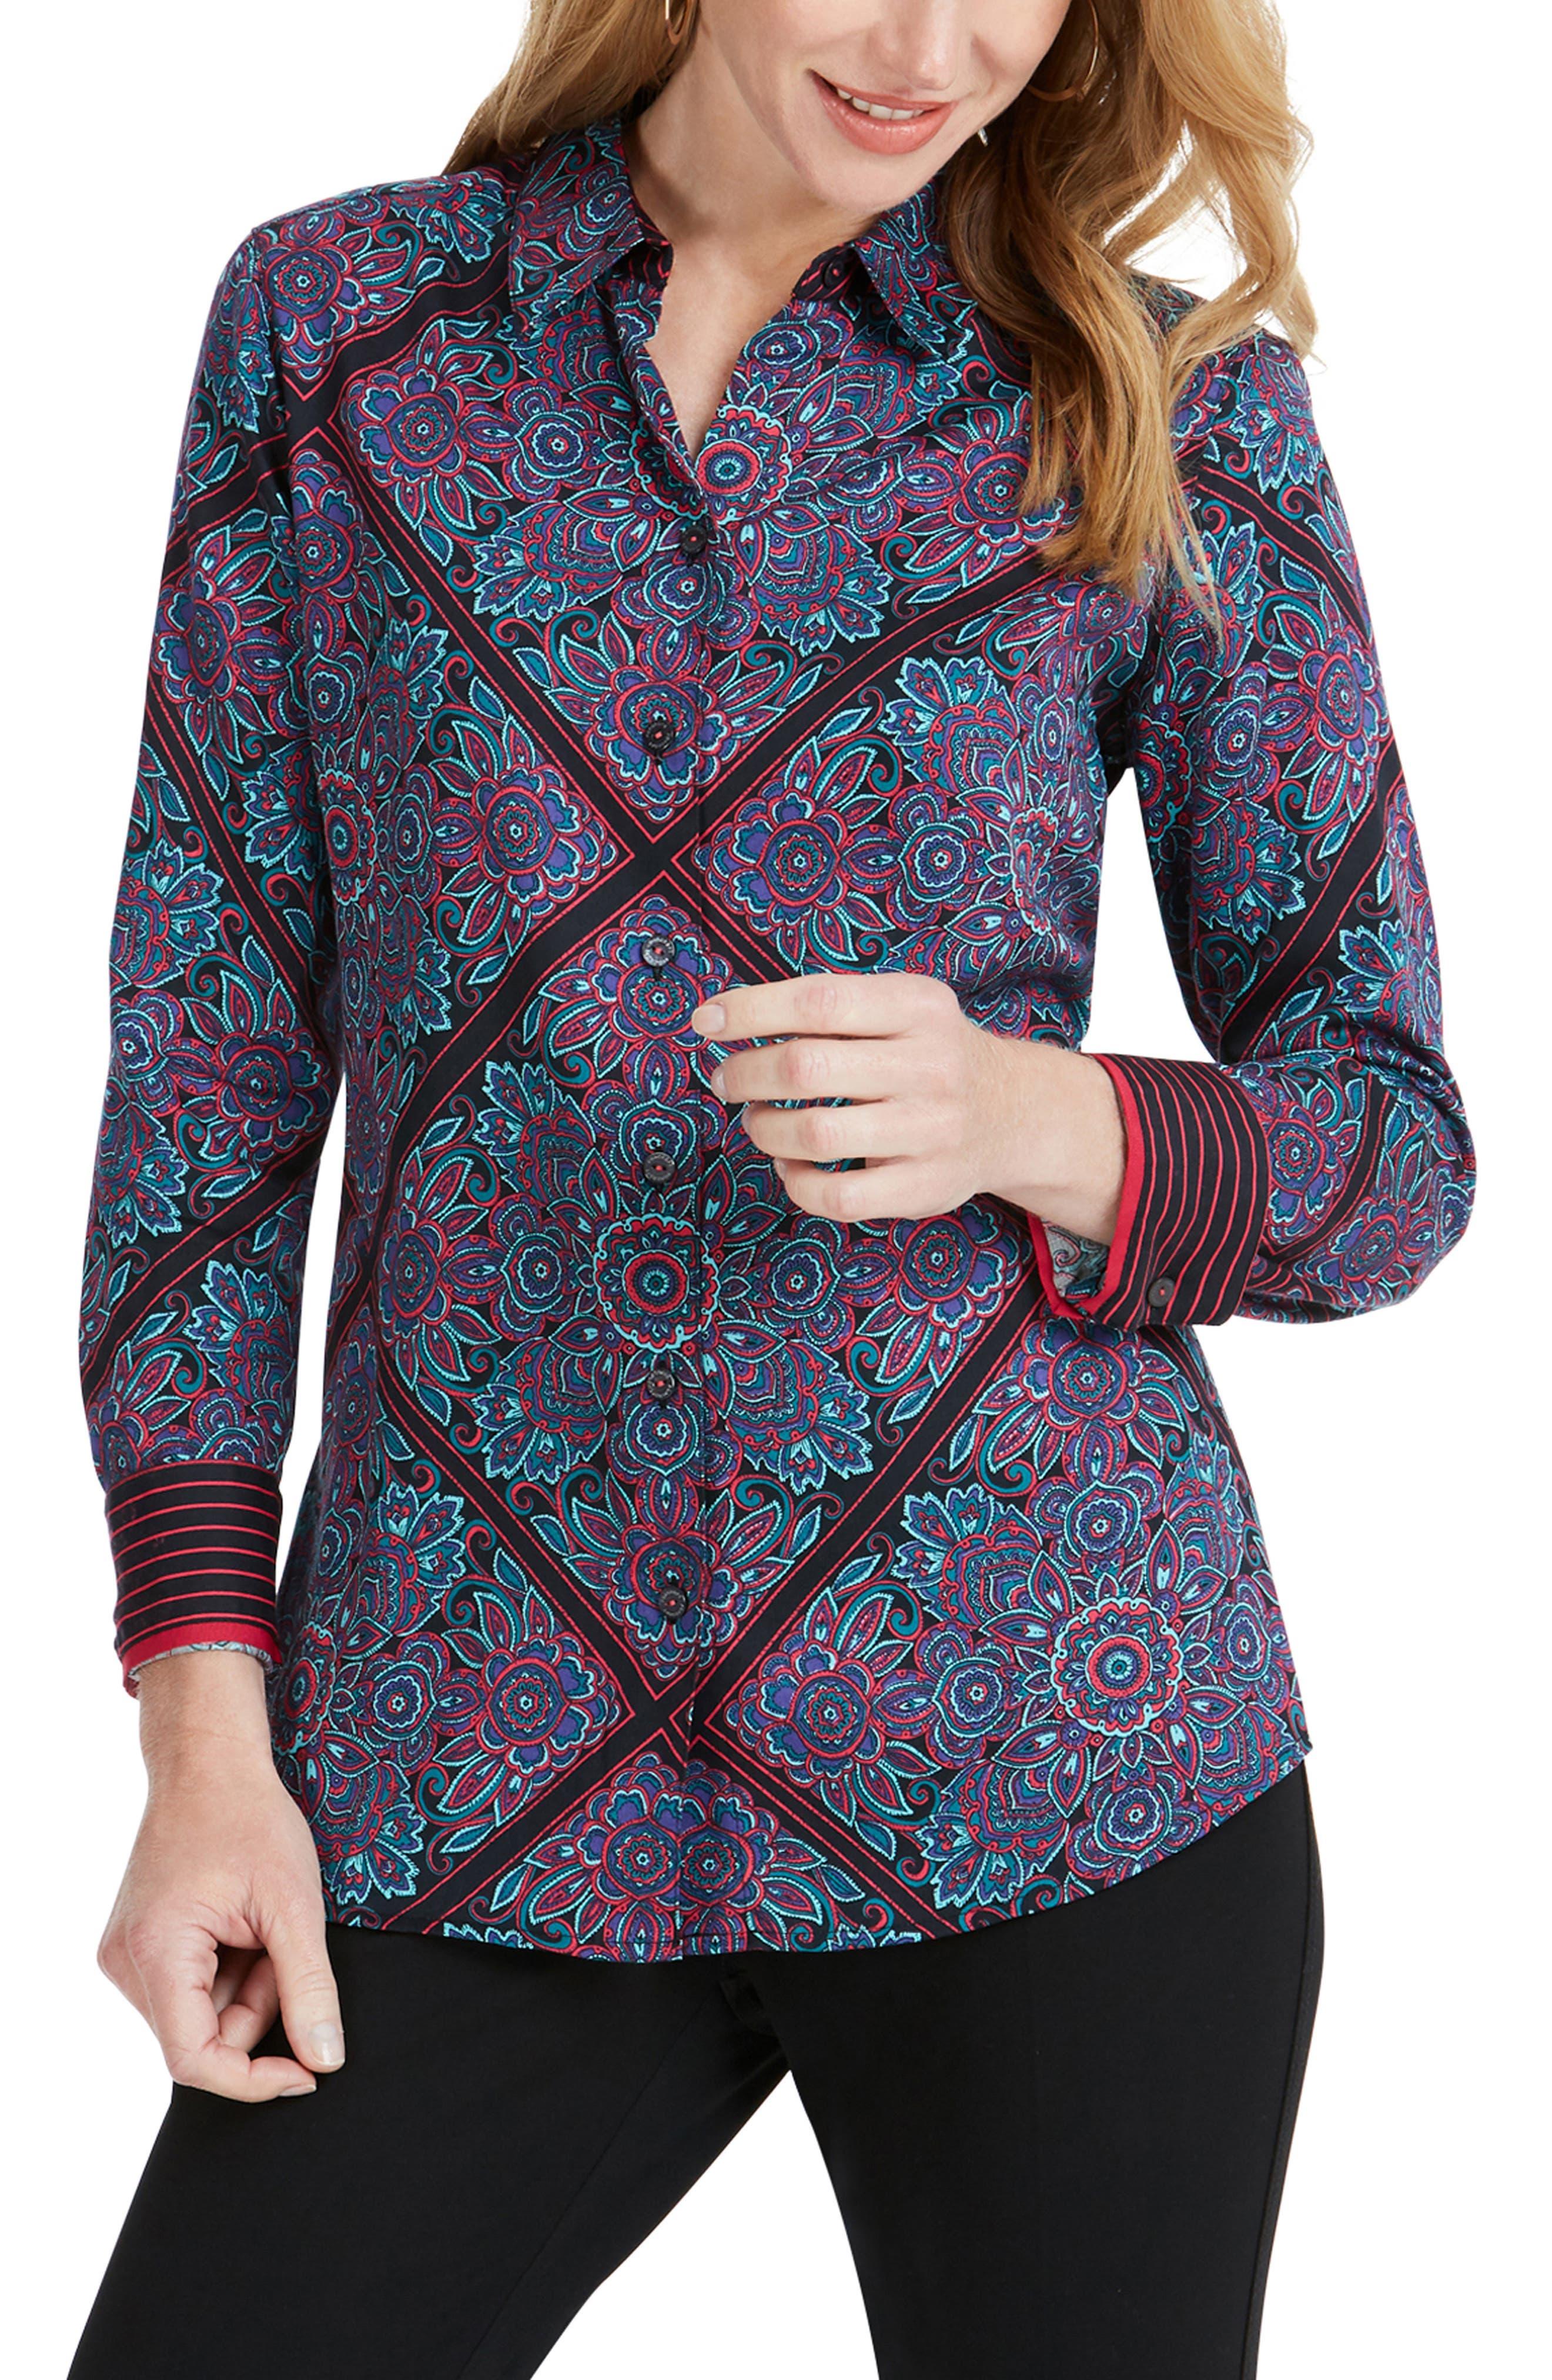 Addison Diamond Paisley Shirt in Multi